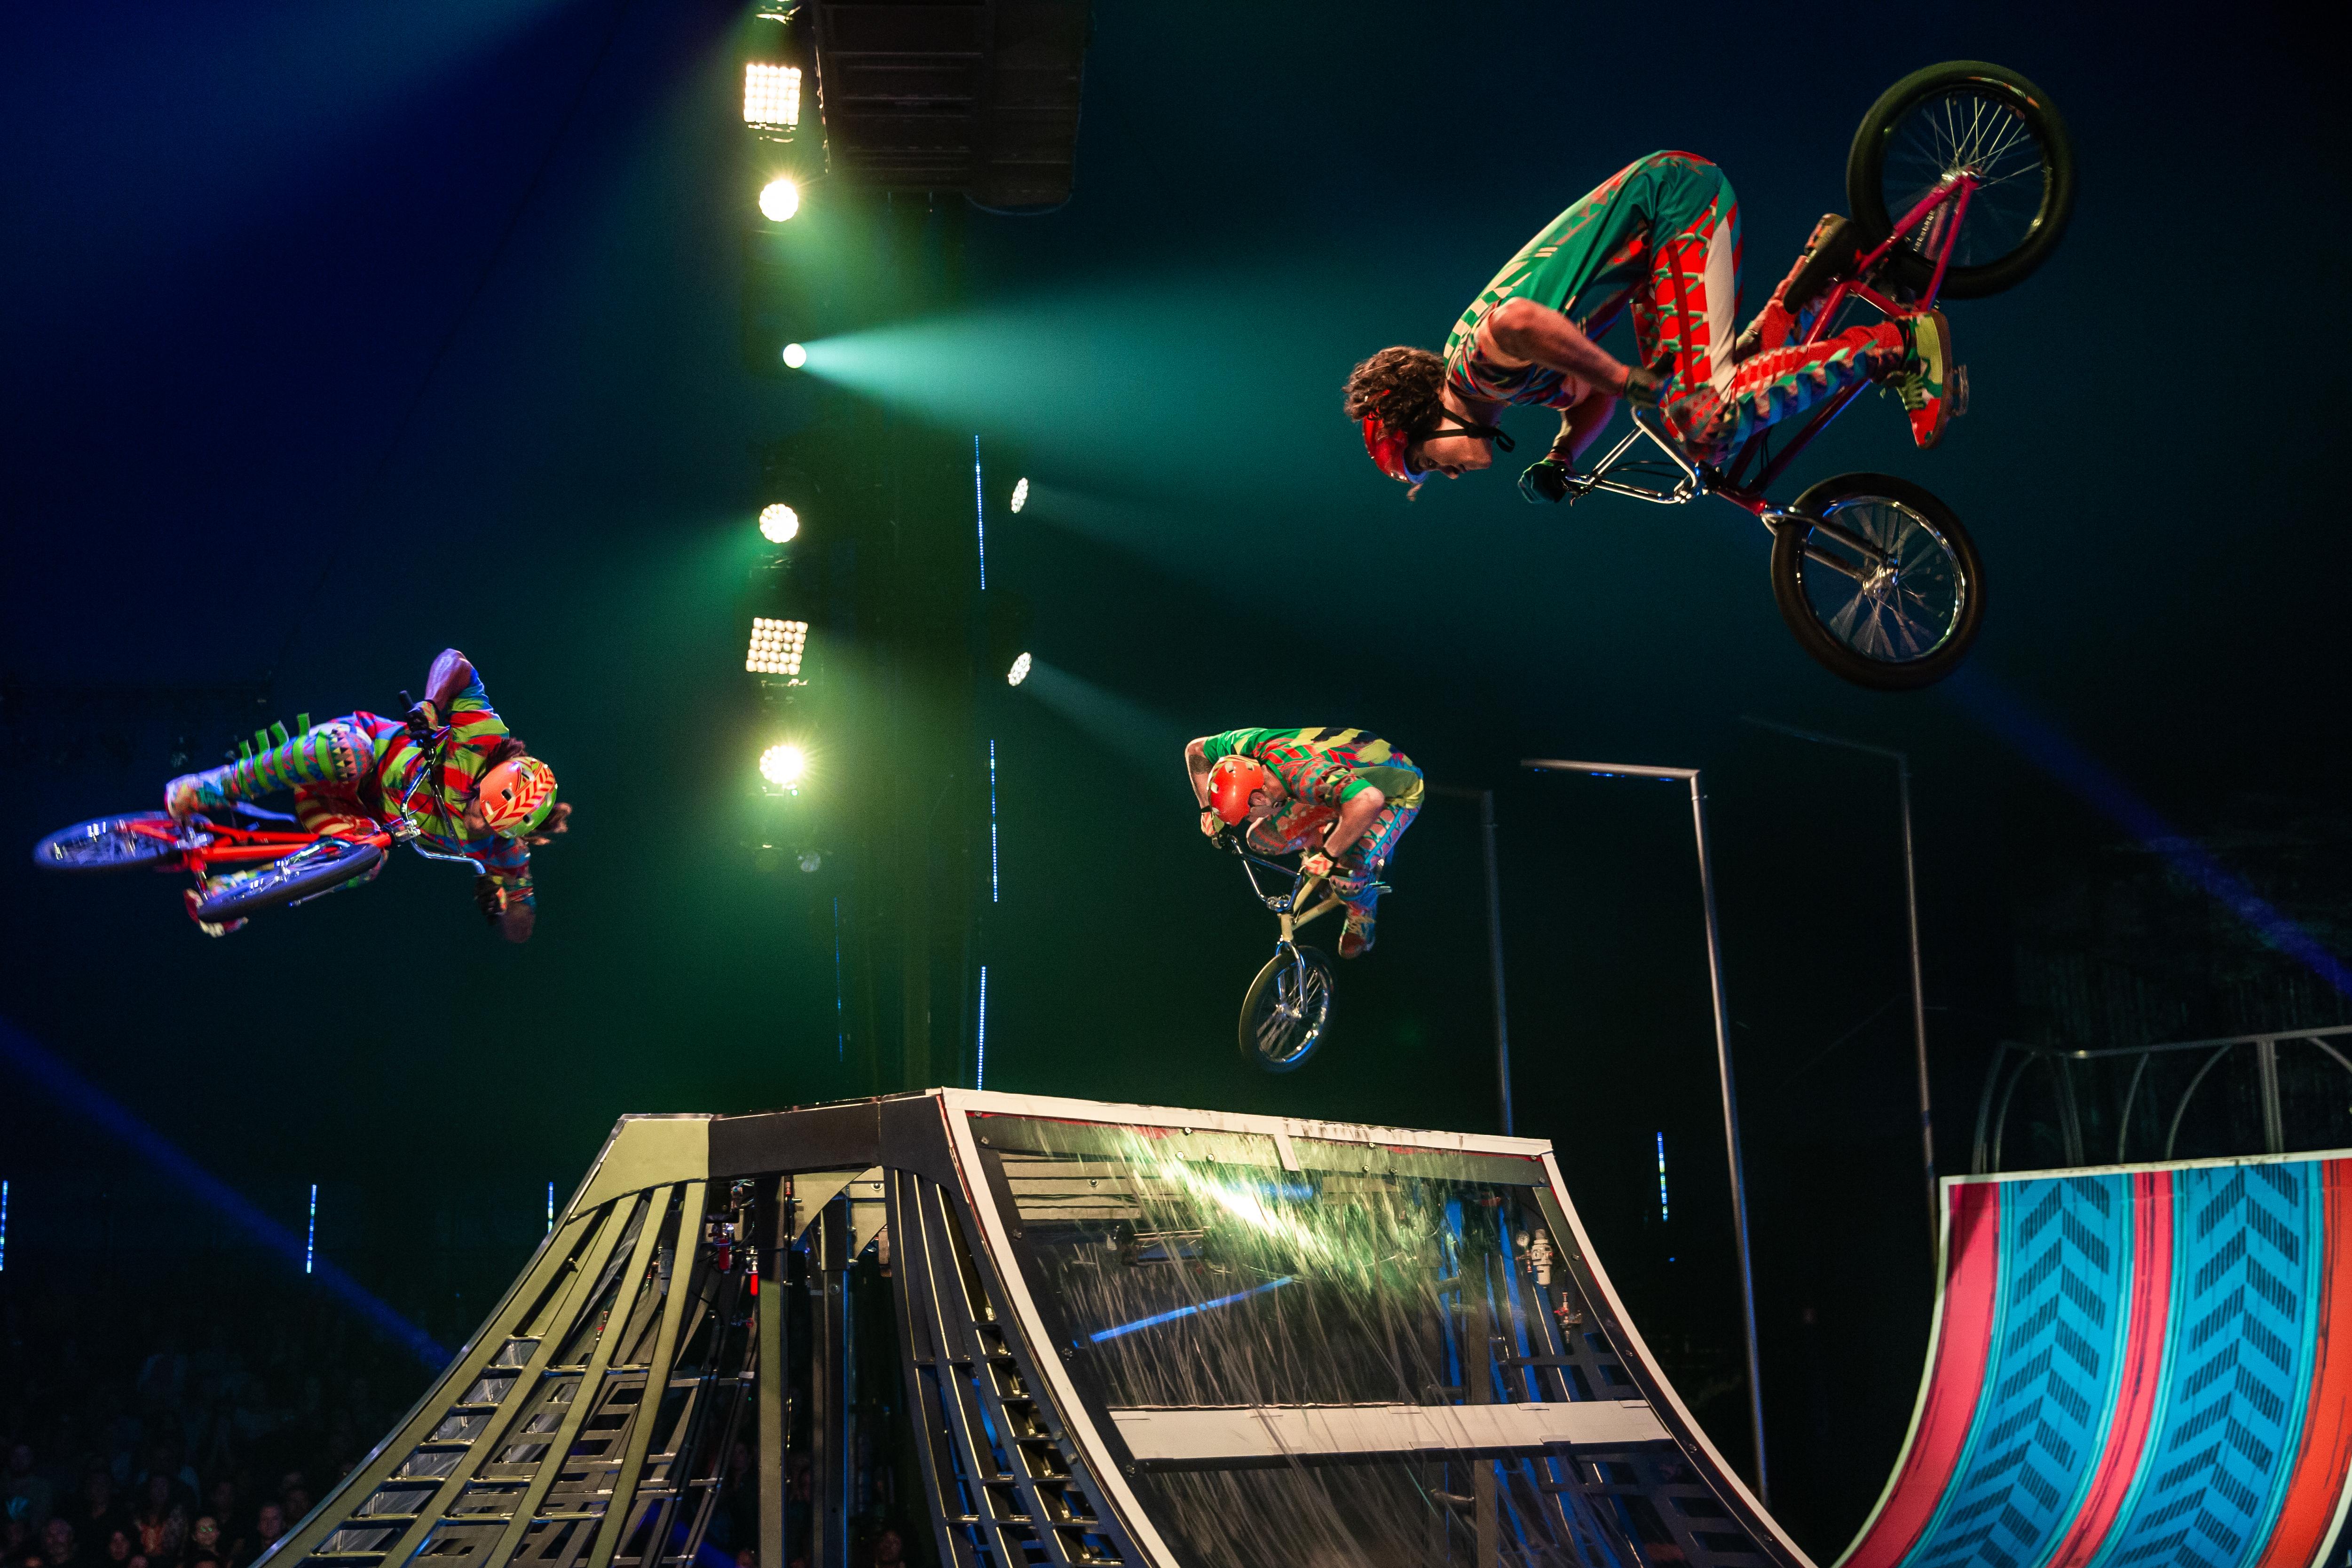 Portland Expo Center Christmas 2020 Cirque du Soleil's Volta coming to the Portland Expo Center in